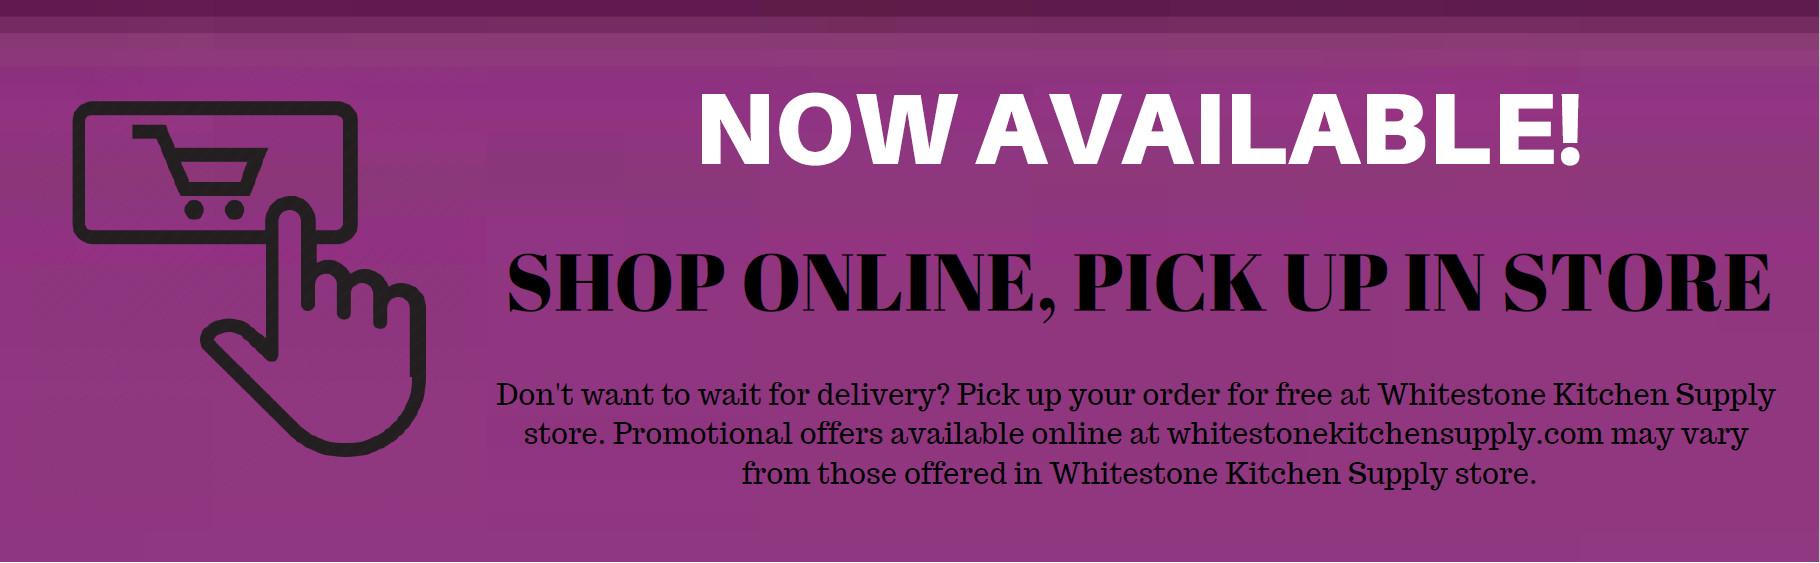 Shop Online, Pick Up in Store | WhiteStone Kitchen Supply Inc.